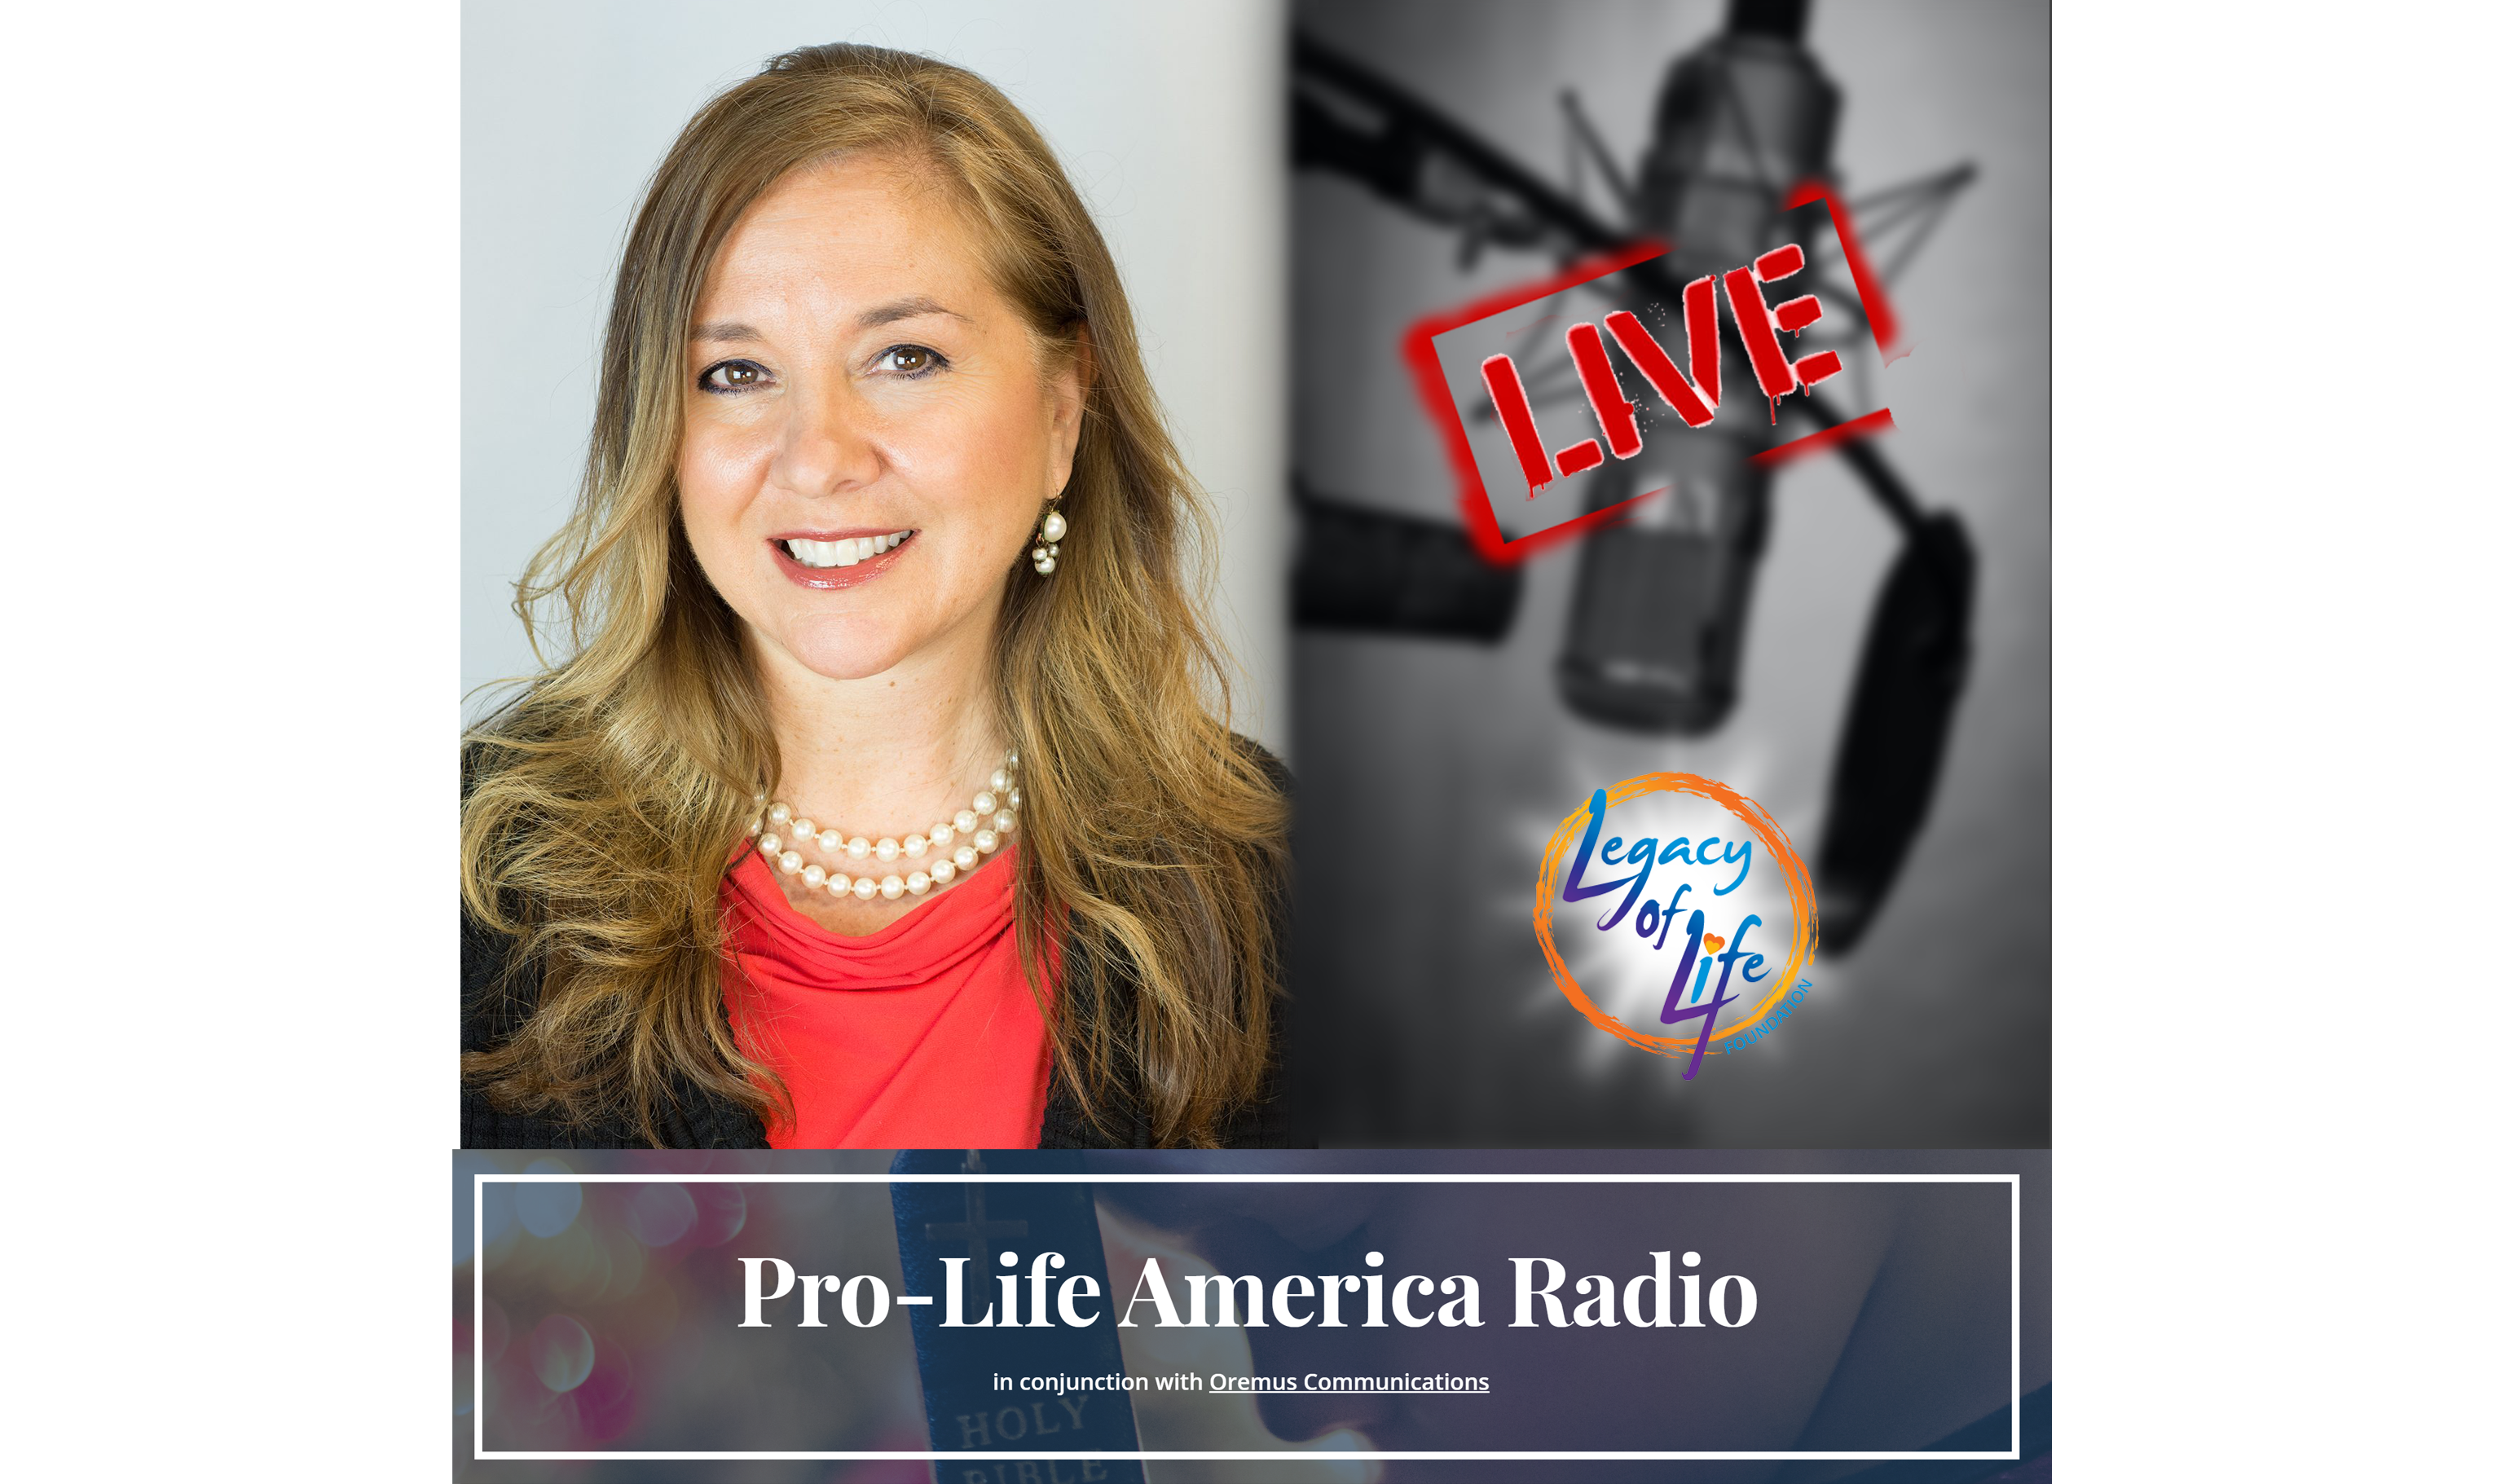 Marie Joseph on Pro-Life American Radio